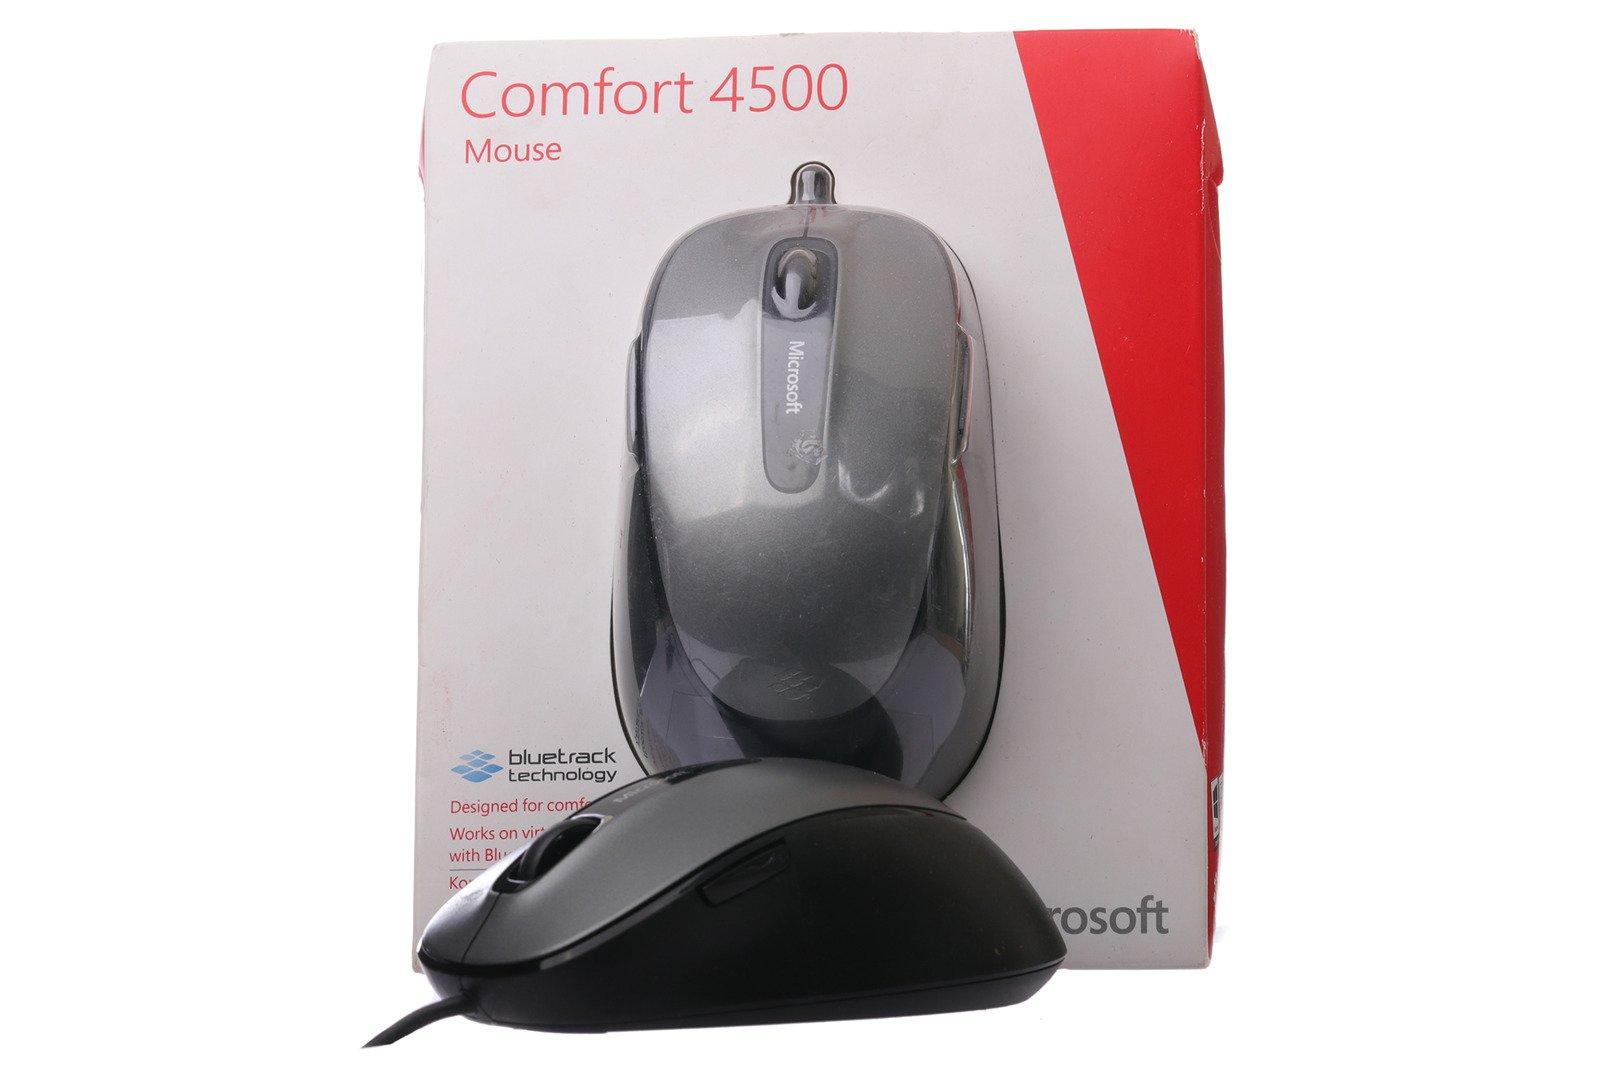 e2731ac38d4 Microsoft Comfort Mouse 4500 4FD-00023 Optical Mouse USB | Computers ...